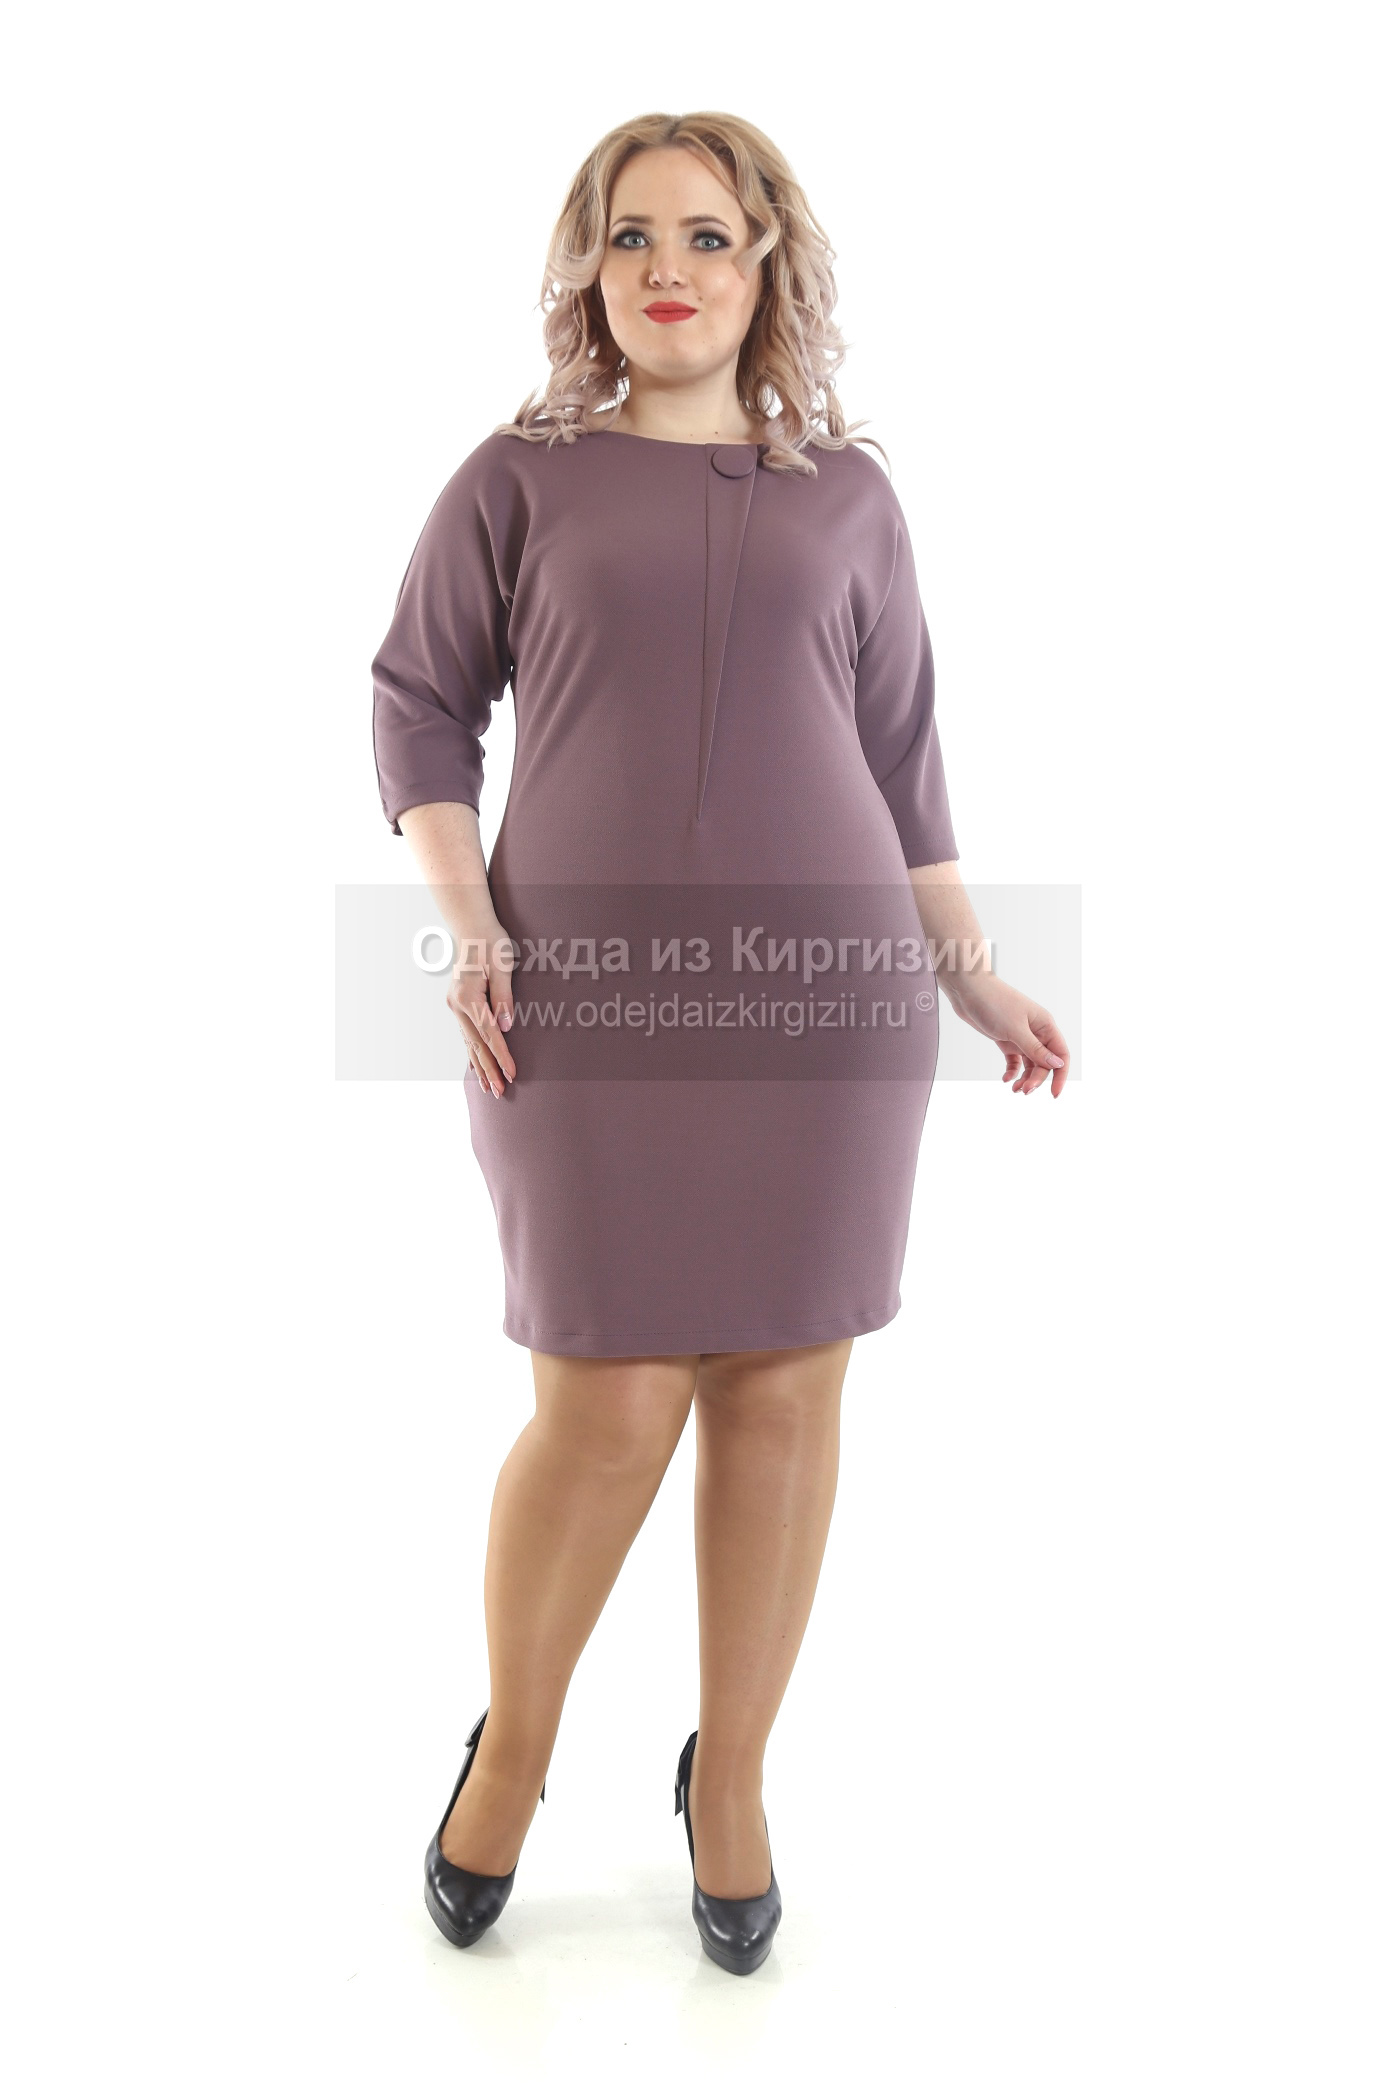 Платье VIN-Пуговка-08